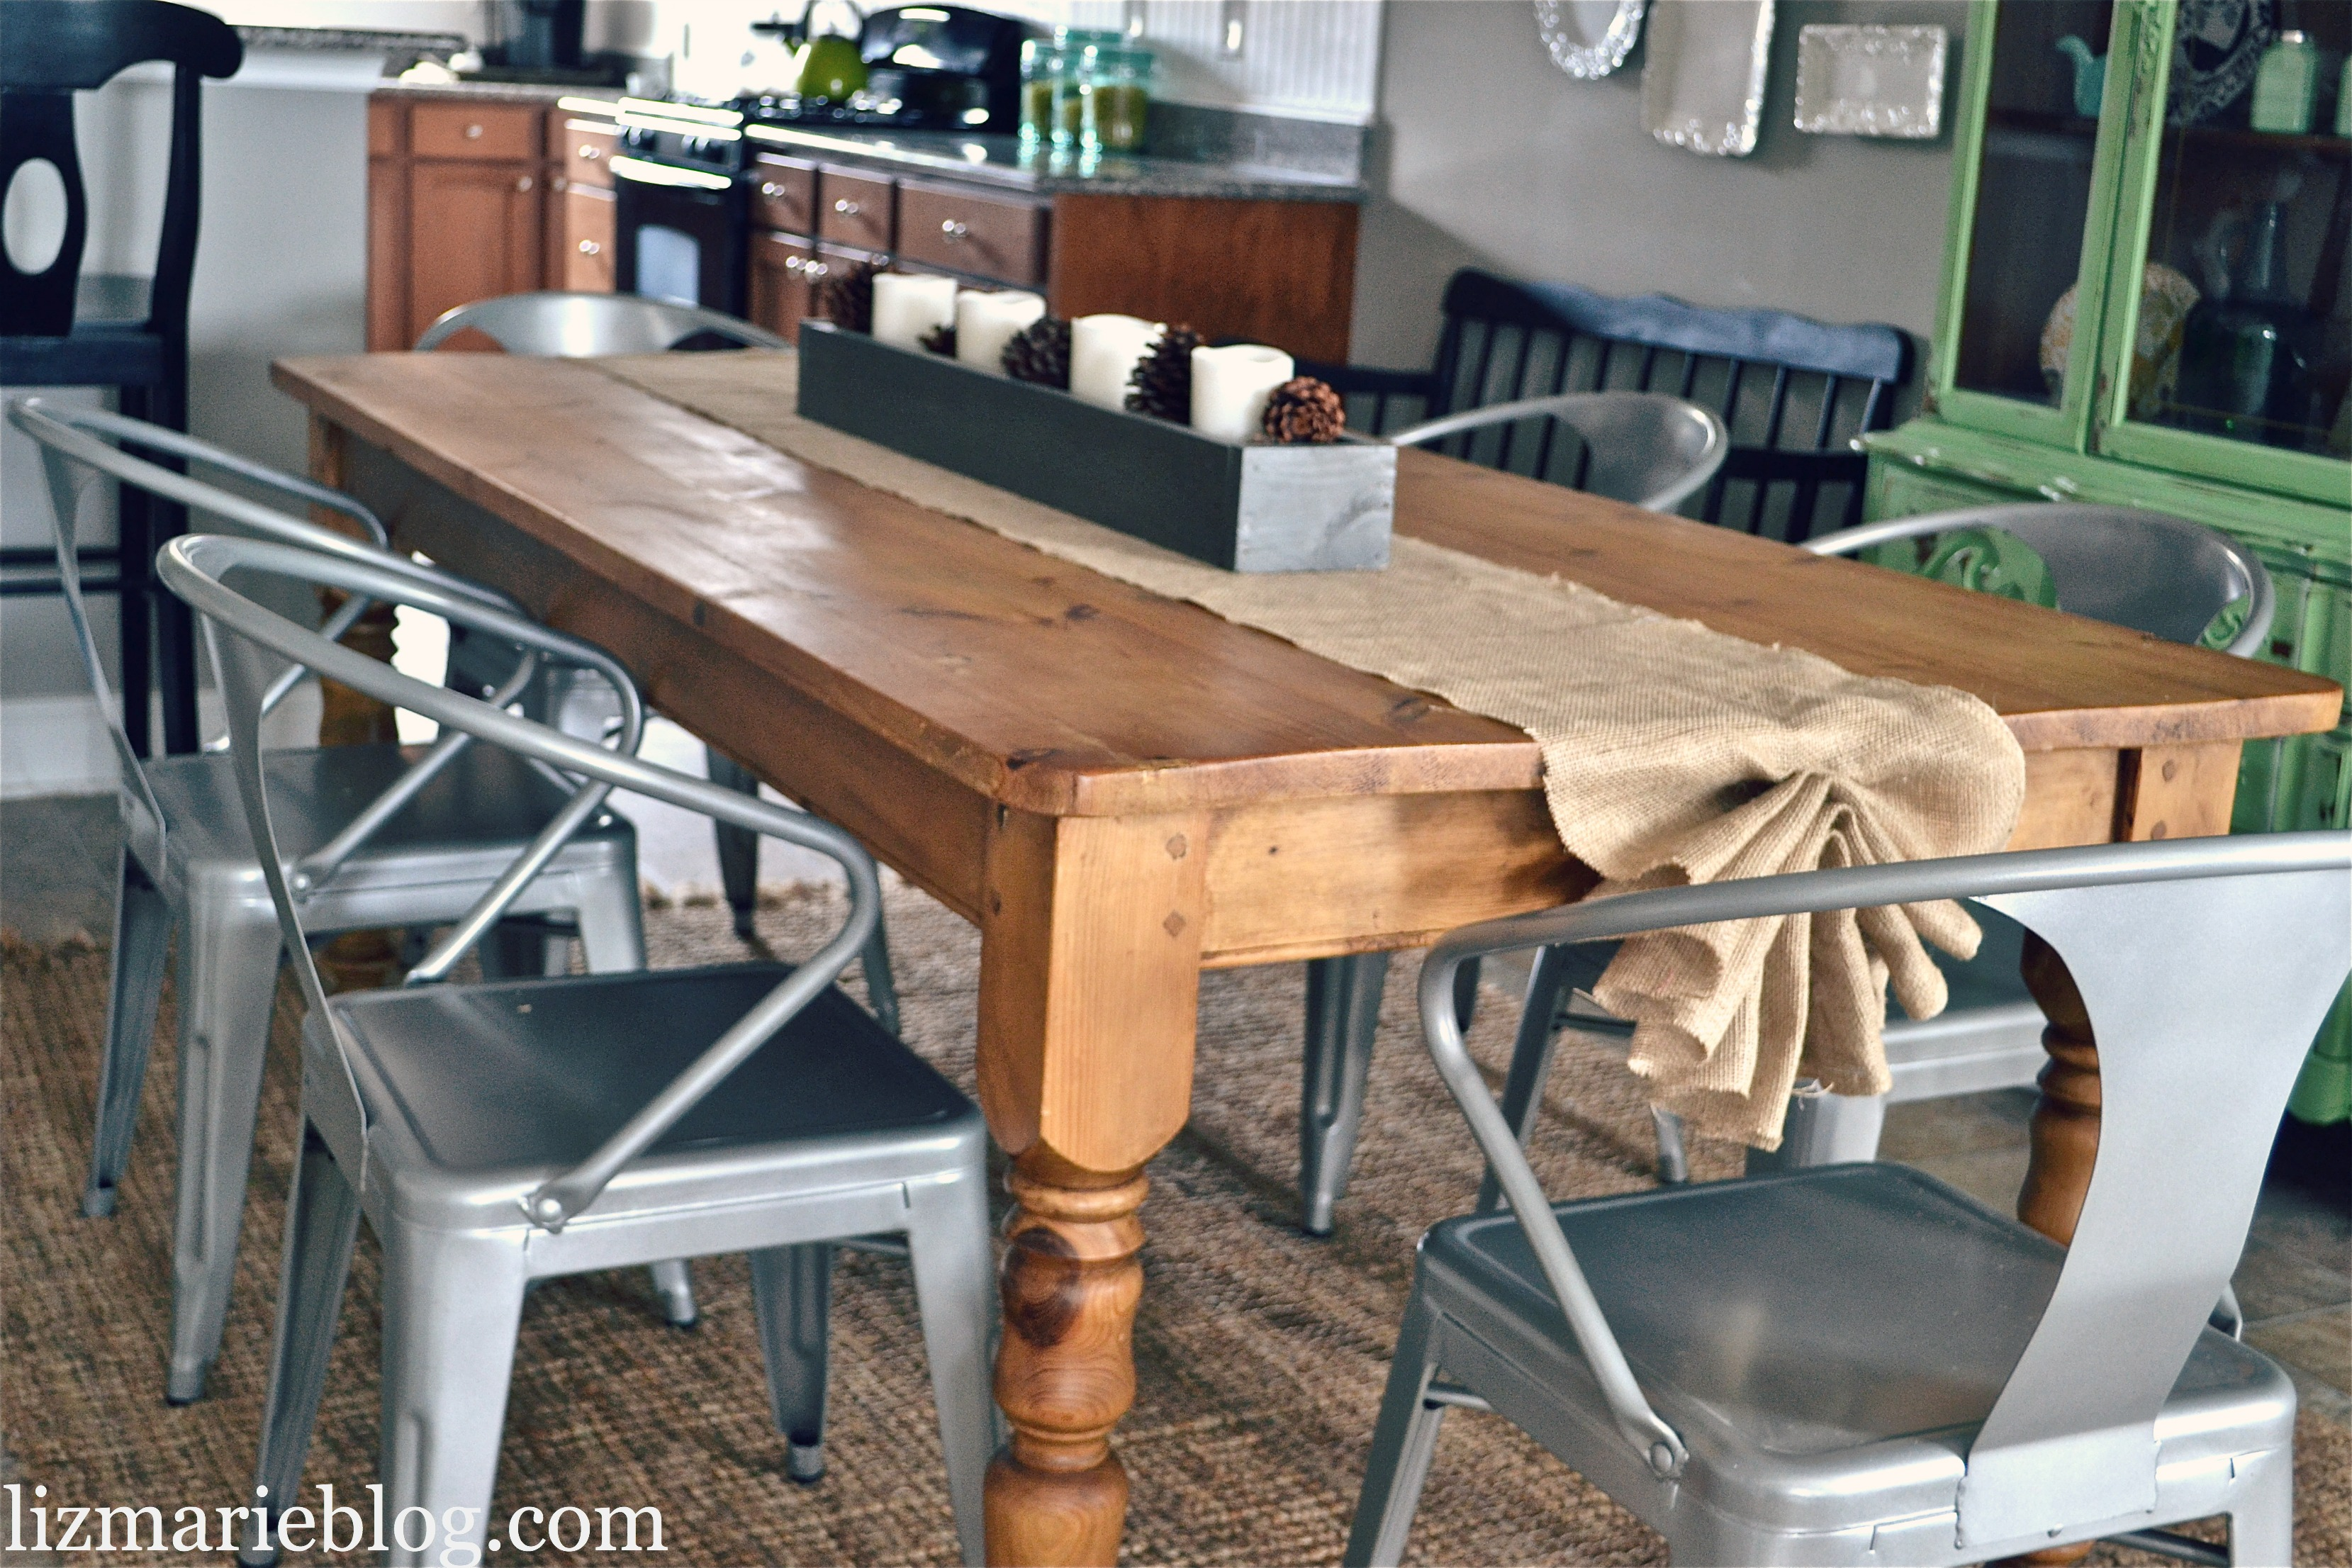 DIY Burlap Table Runner - Liz Marie Blog